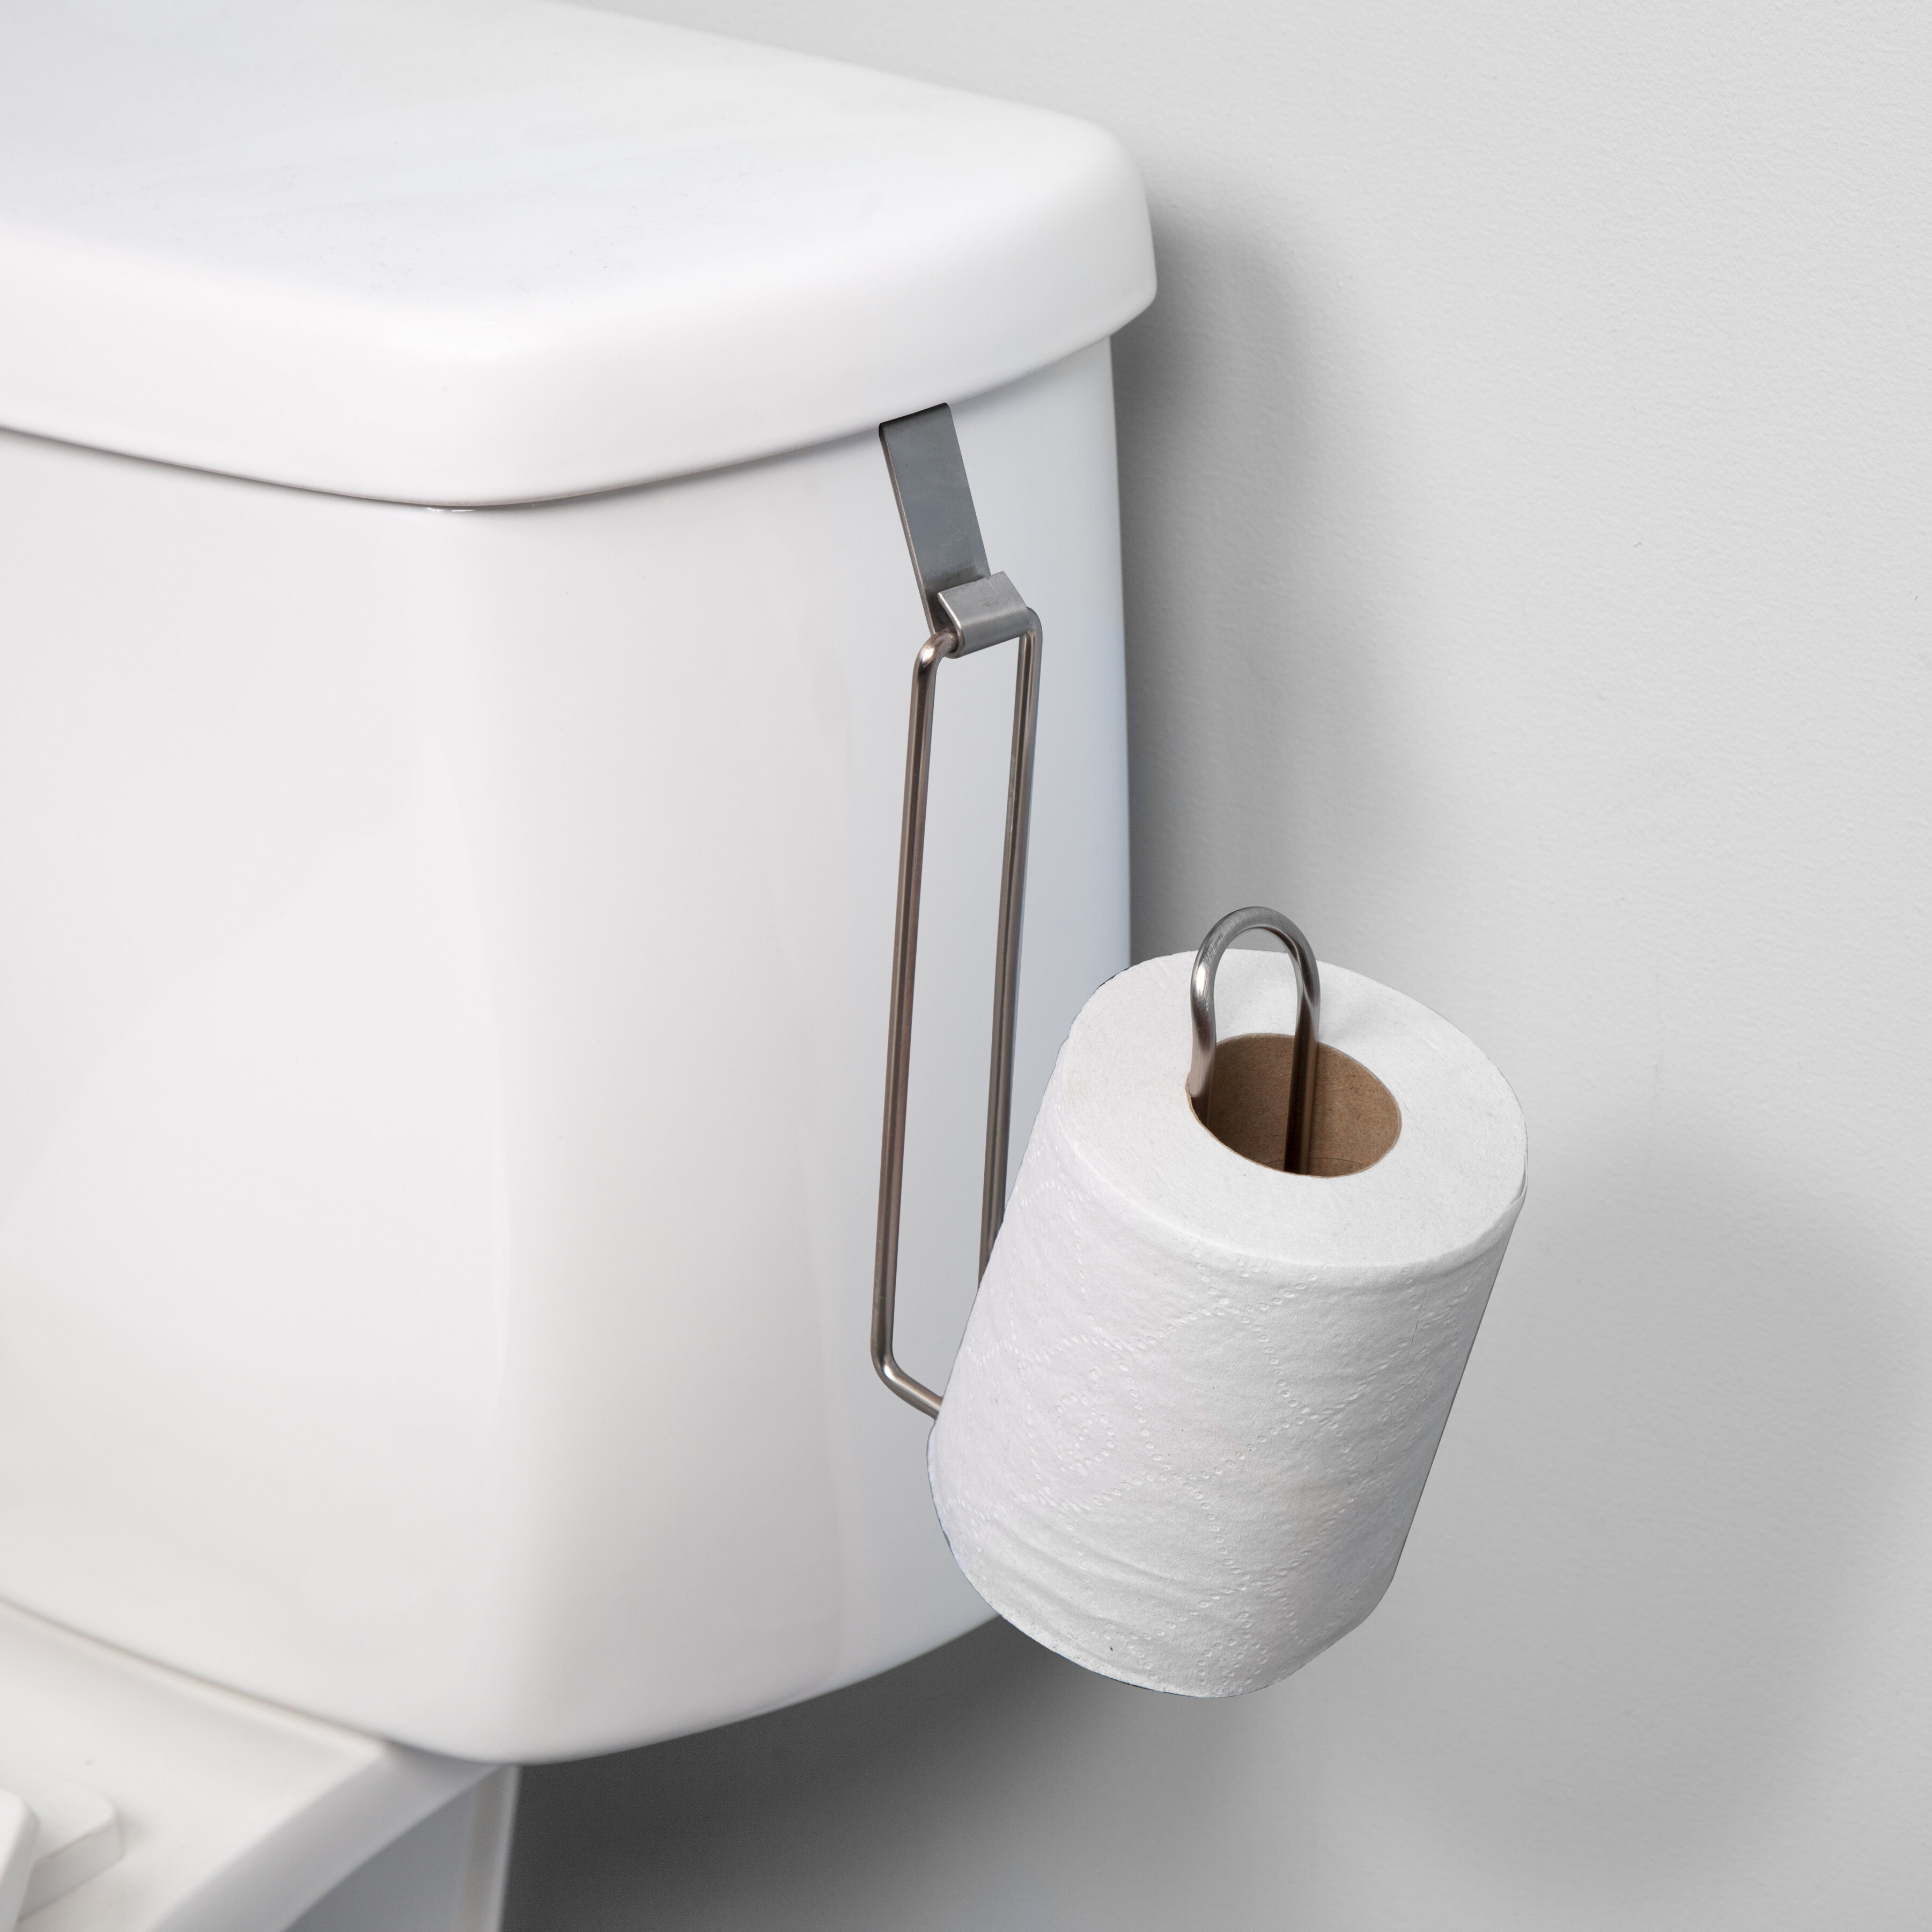 RV Self Adhesive Toilet Paper Holder Wall Mount Mounted Dispenser Nickel Brushed